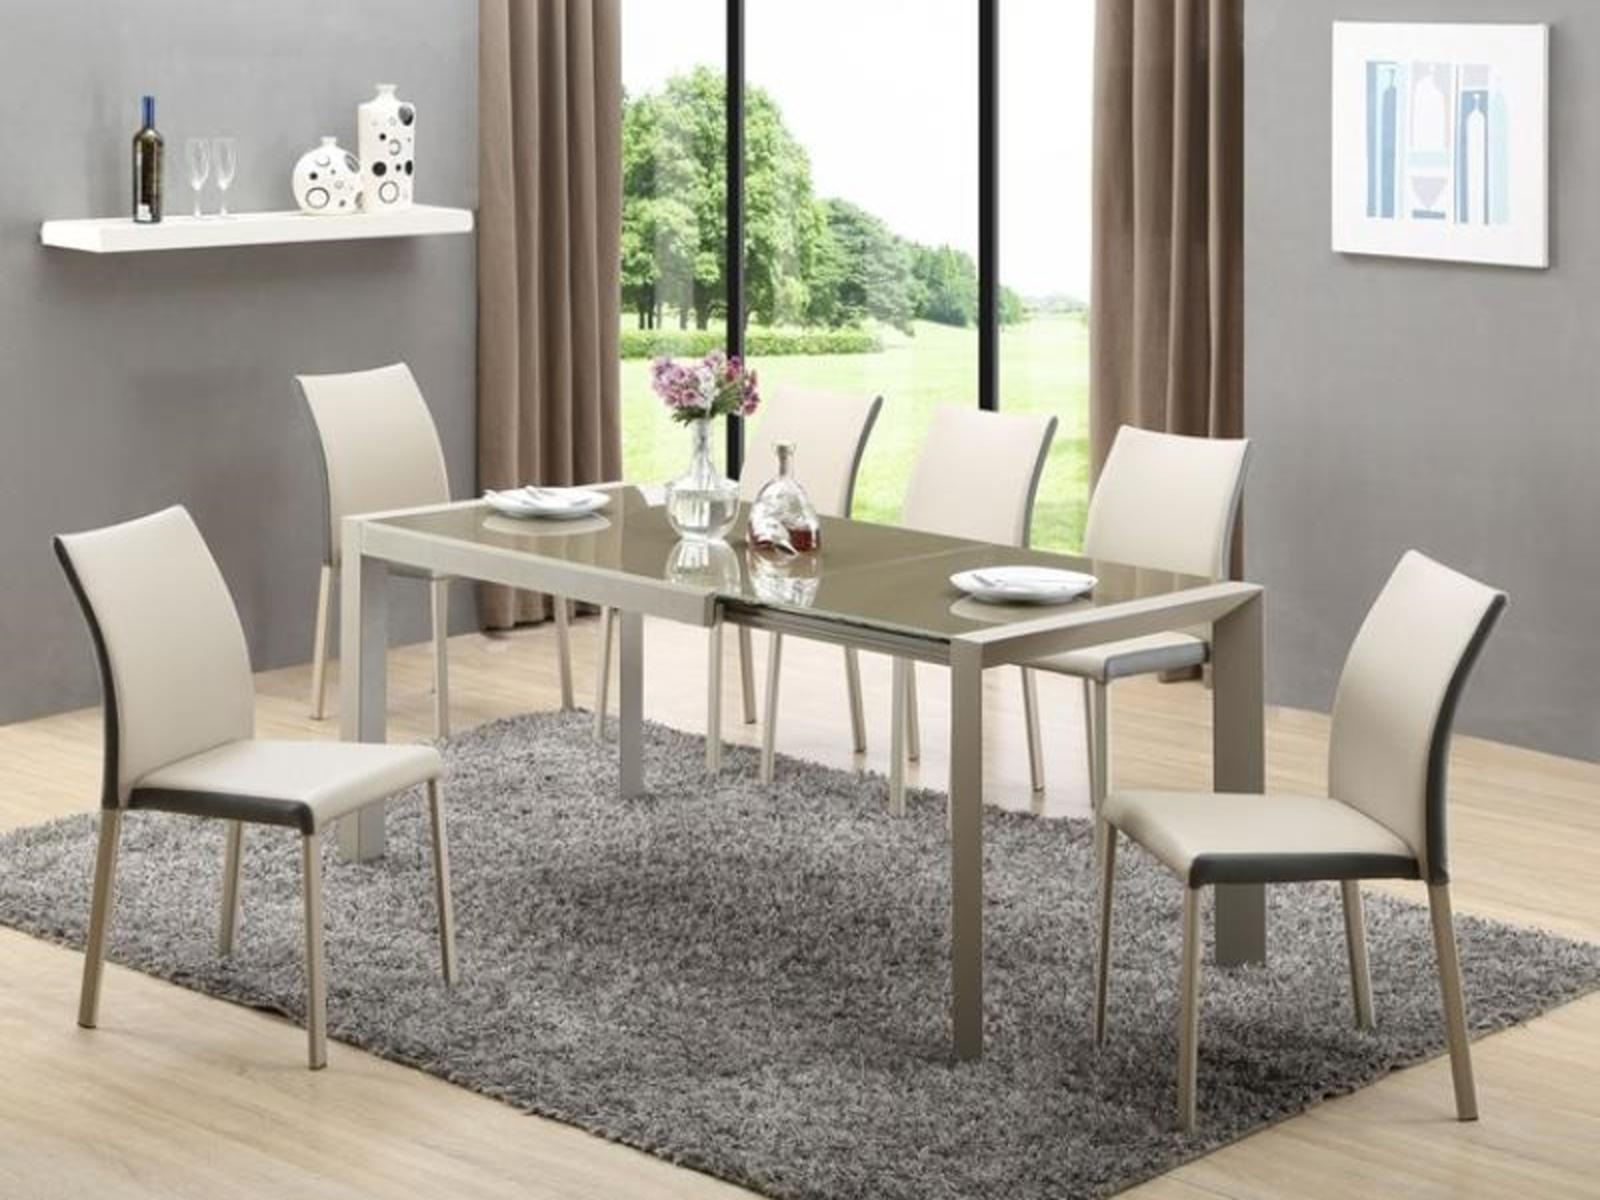 Halmar Jídelní stůl rozkládací ARABIS, kov/sklo